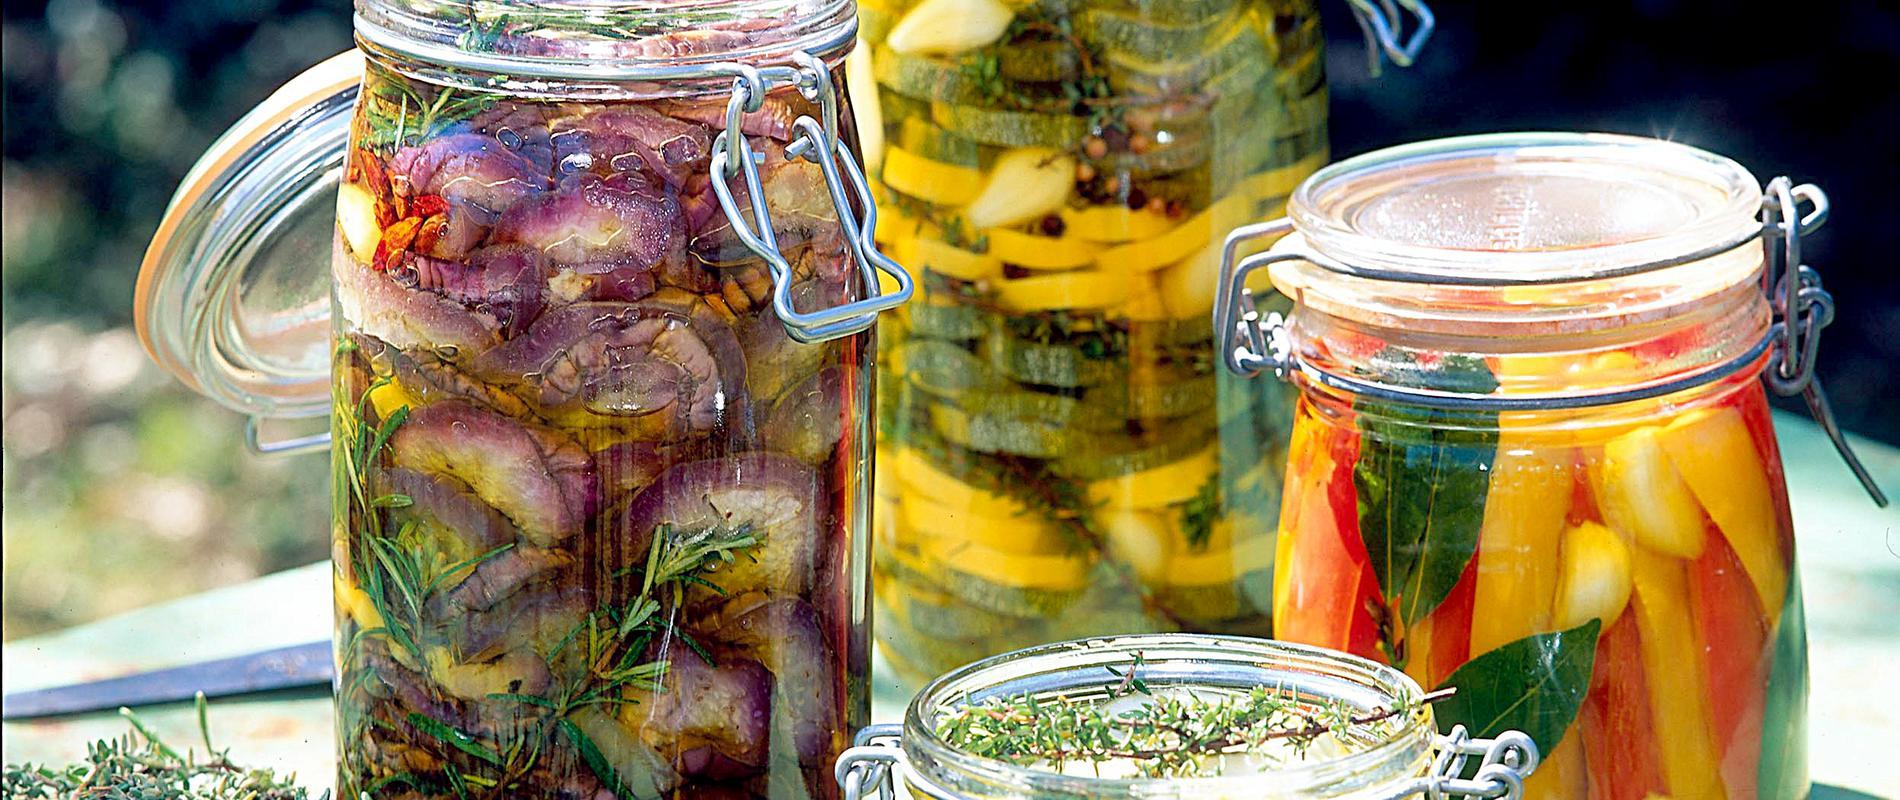 Italian recipe to preserve vegetables